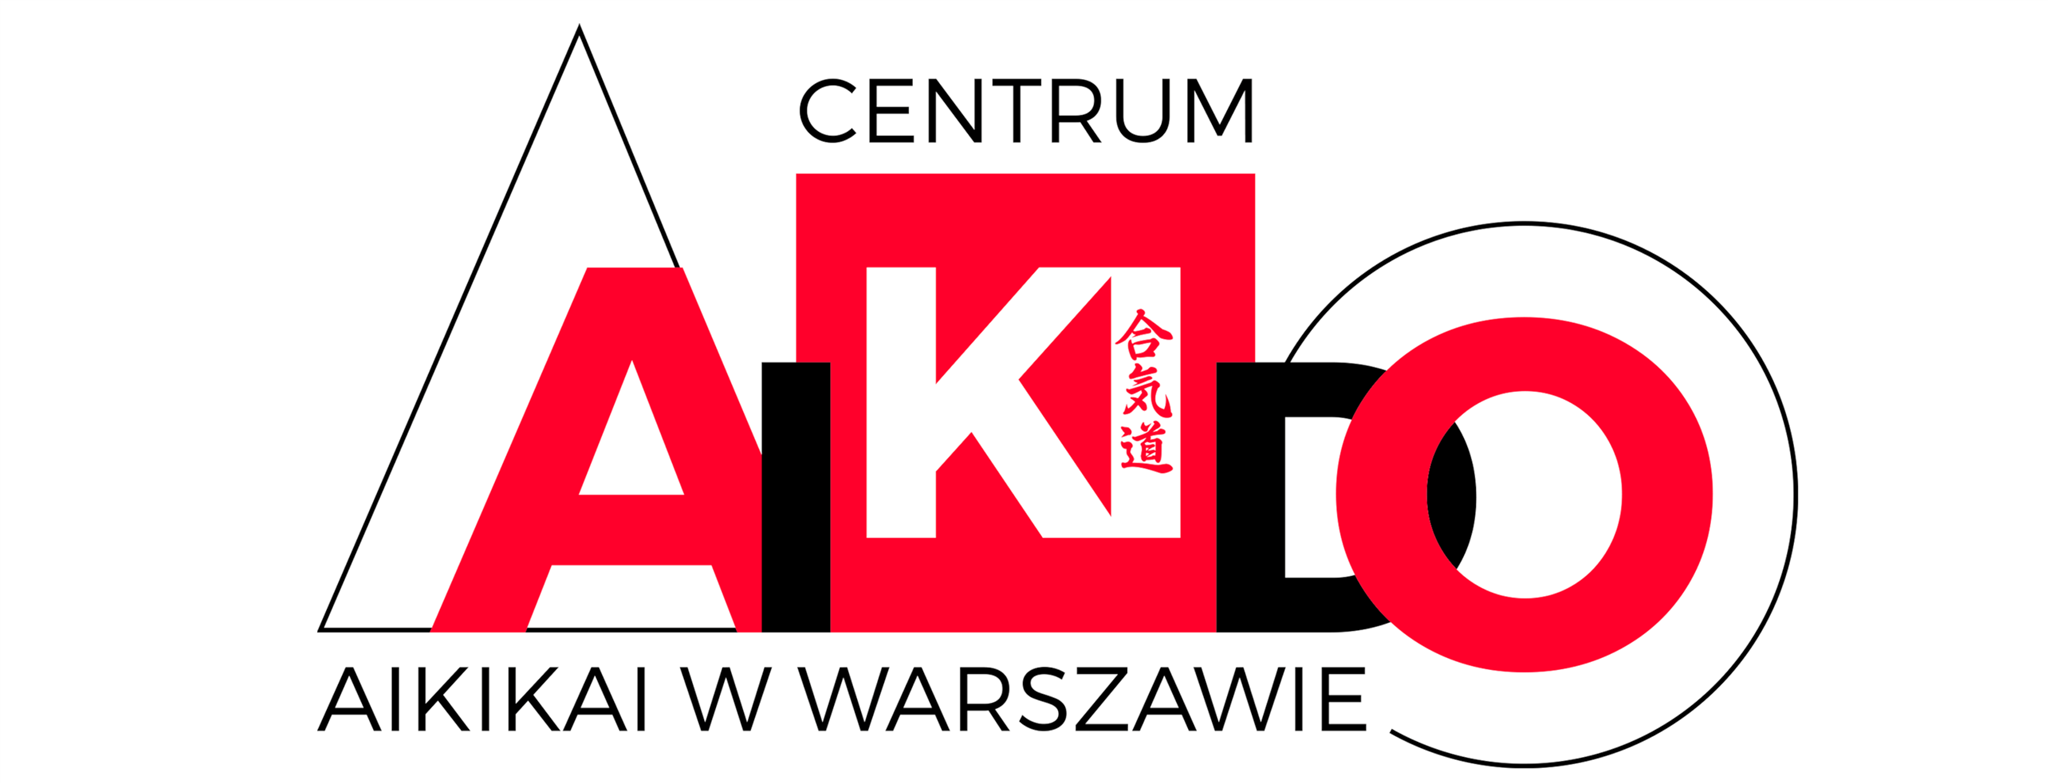 Sebastian Maciaszek | Centrum Aikido w Warszawie R Hoffmann 6 dan